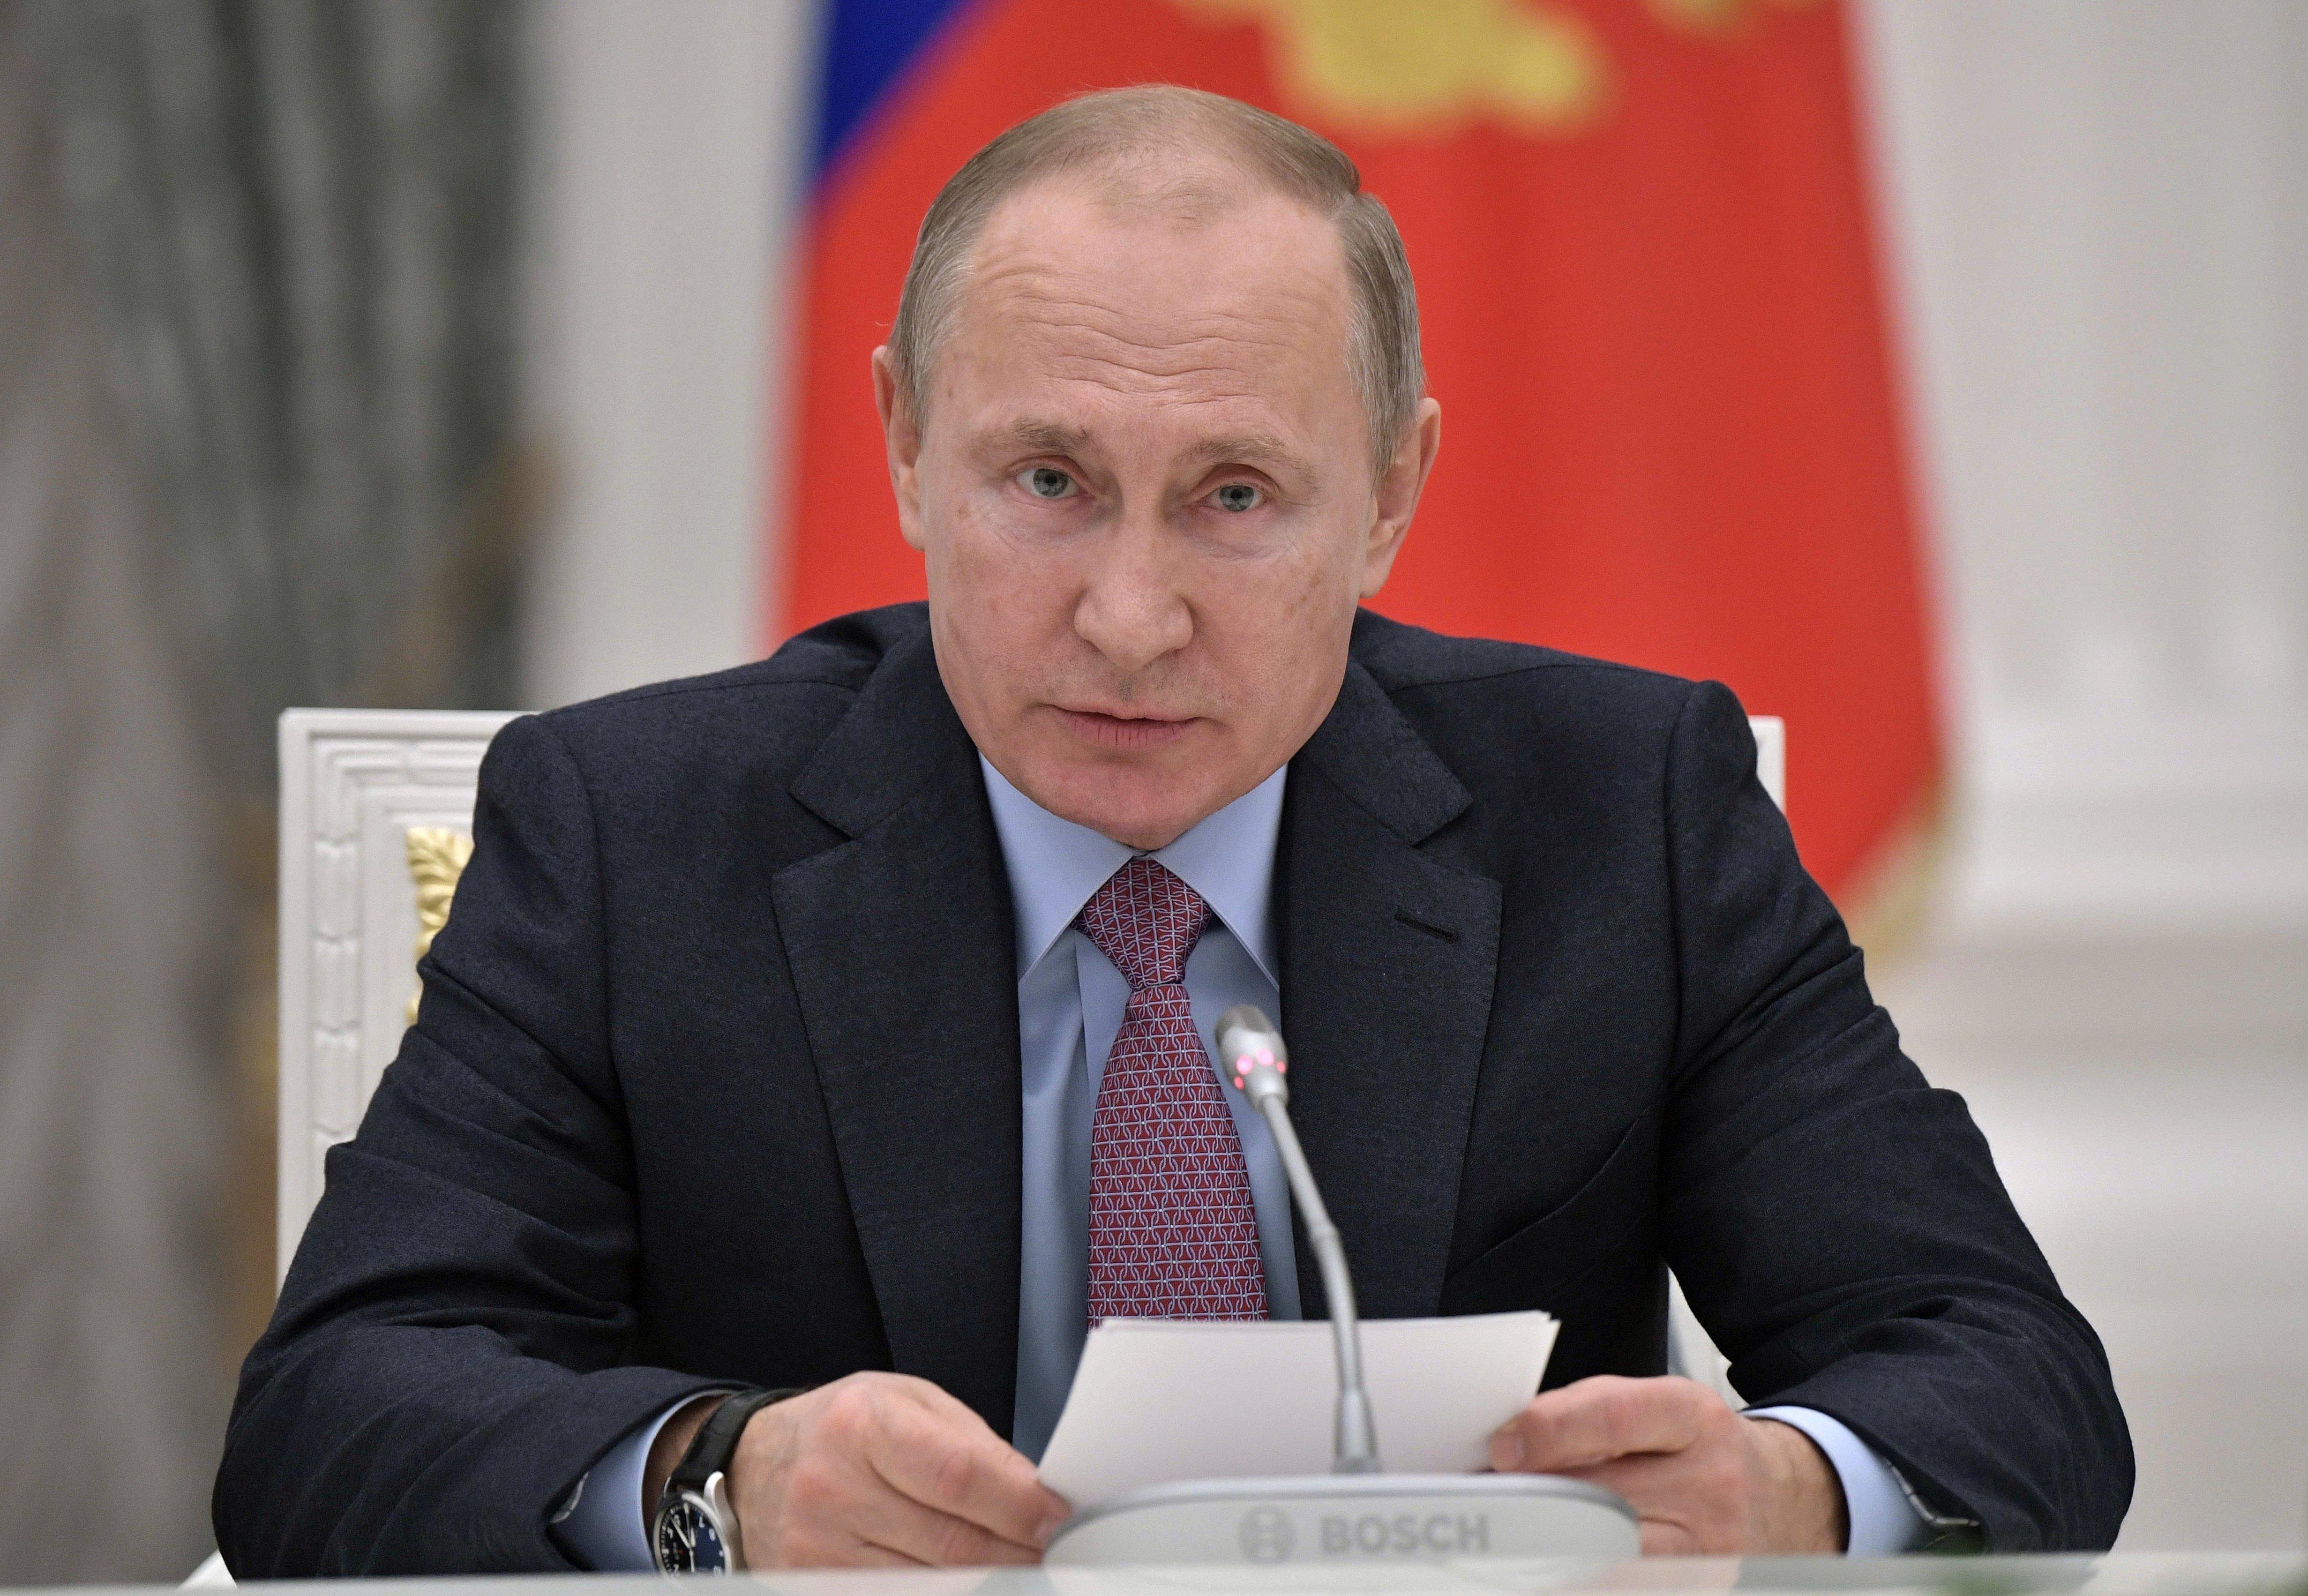 Image: Vladimir Putin pictured at the Kremlin on Tuesday.